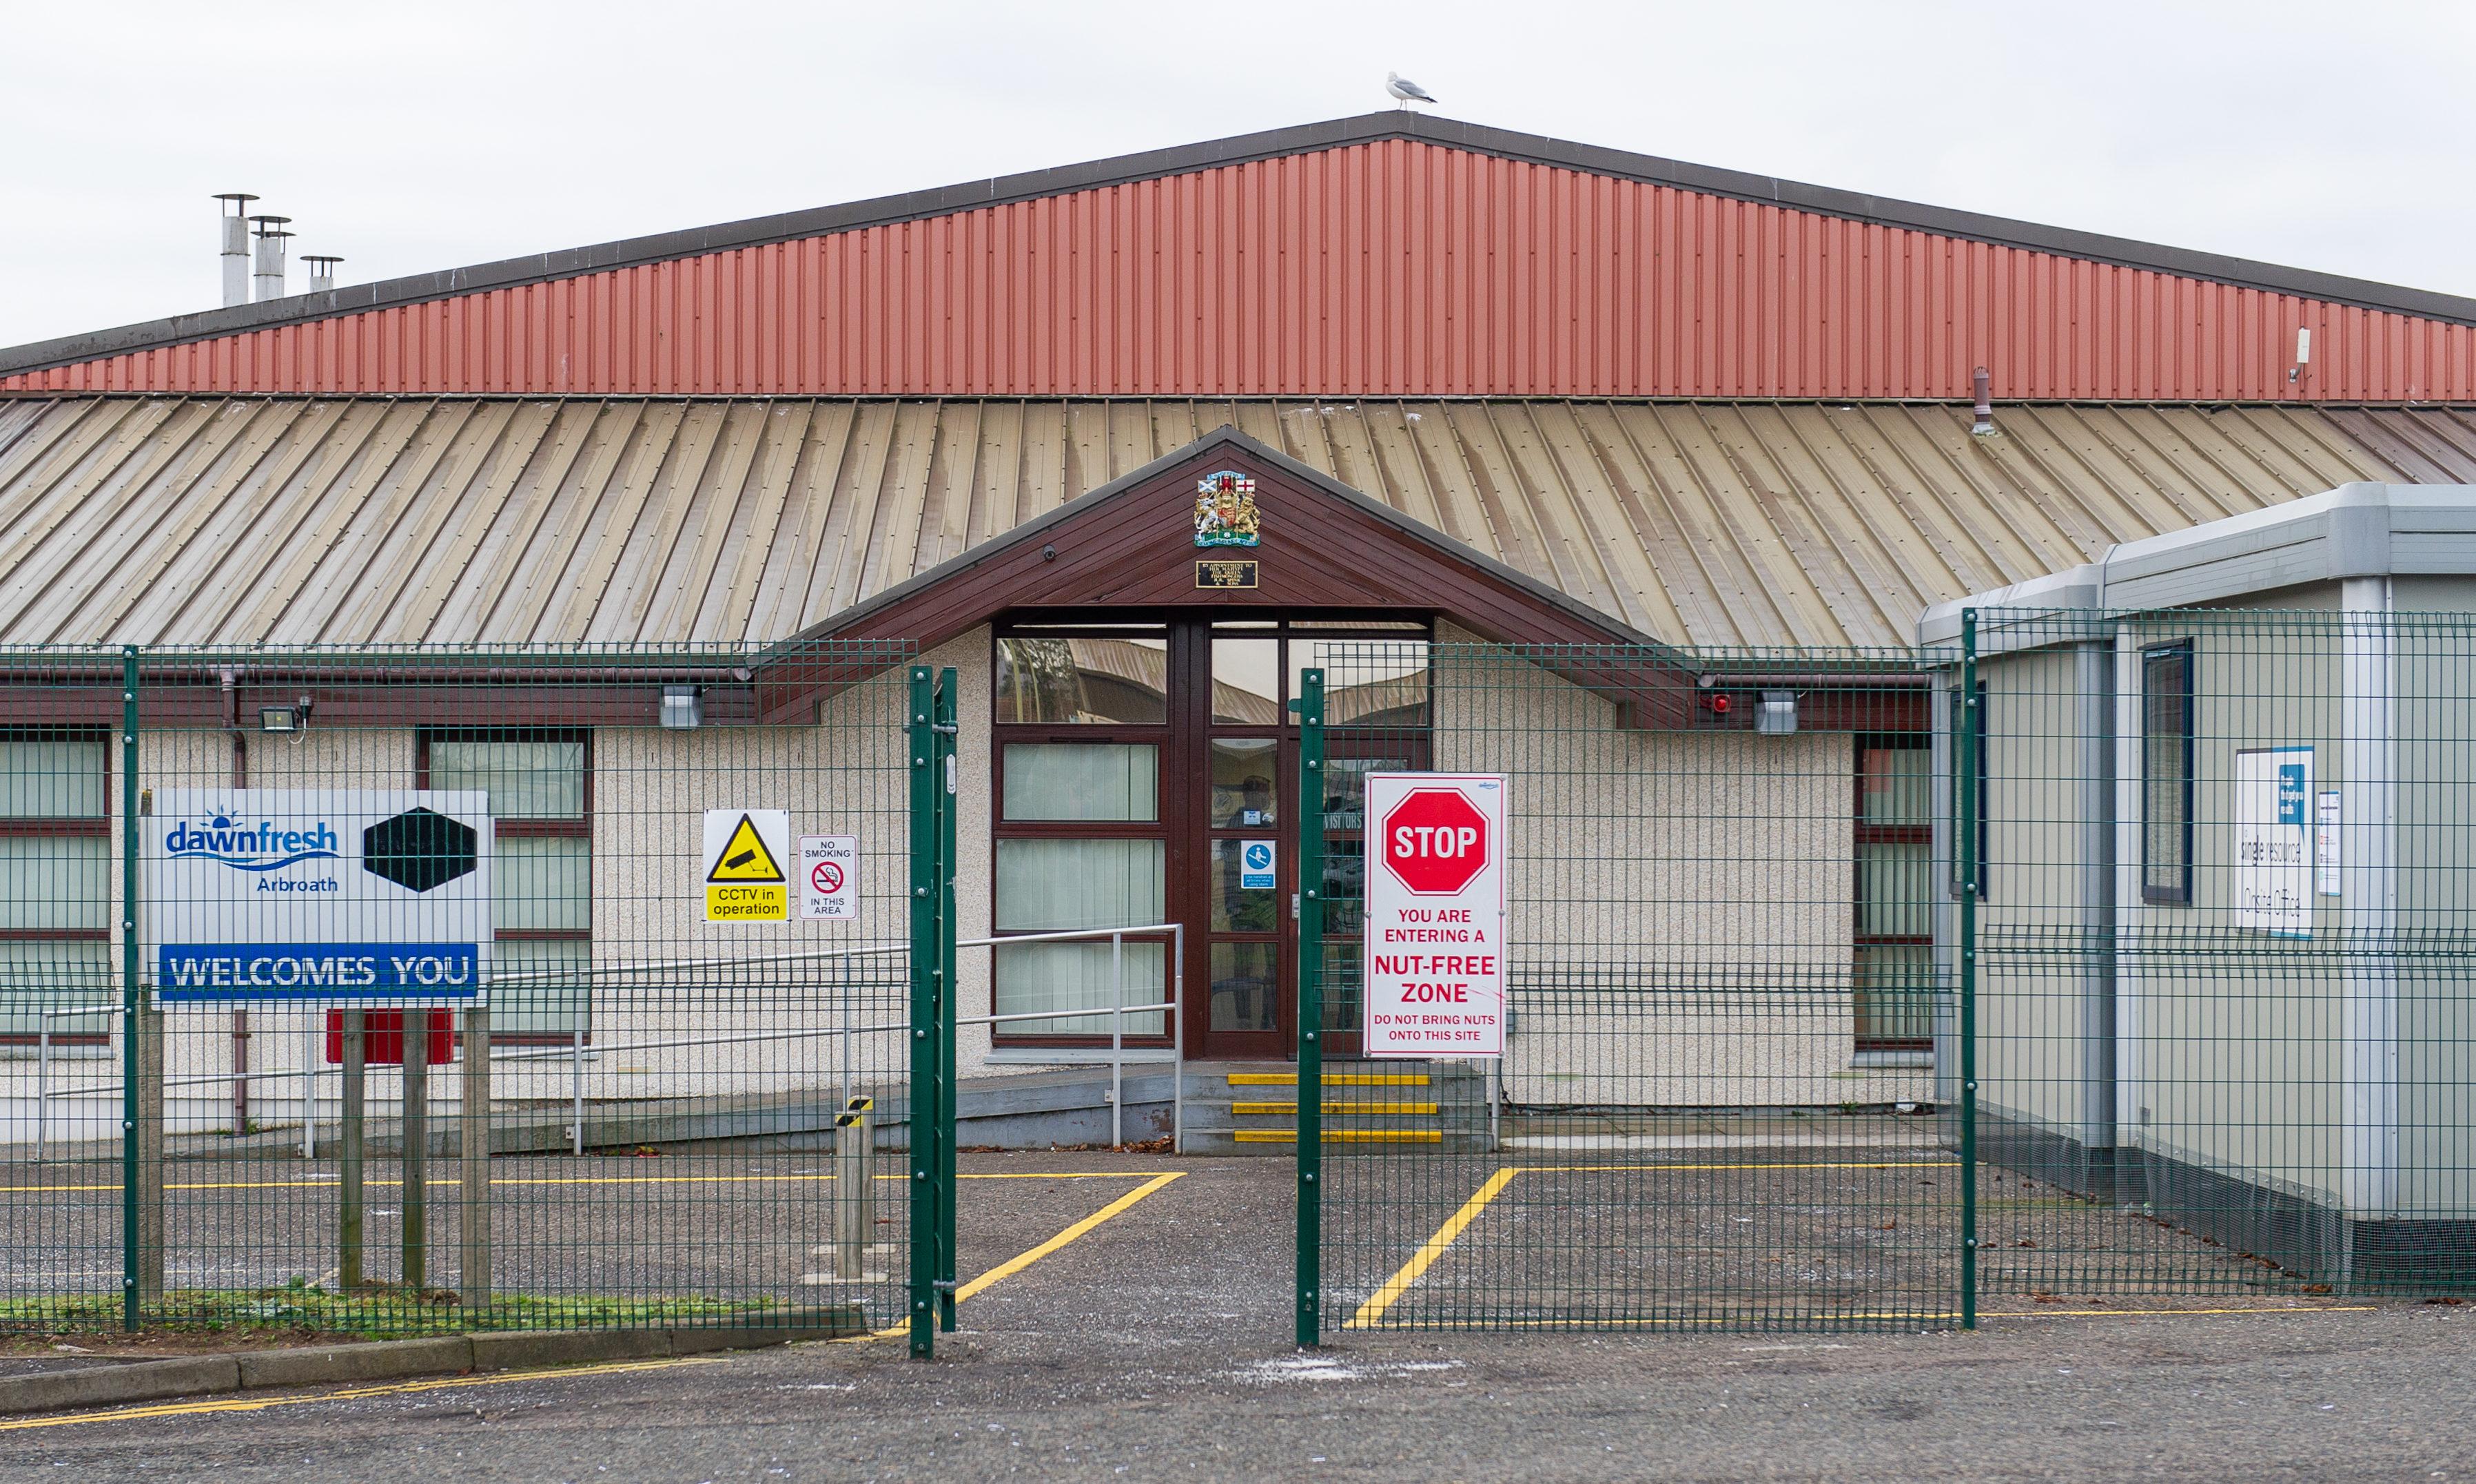 The Dawnfresh factory in Arbroath